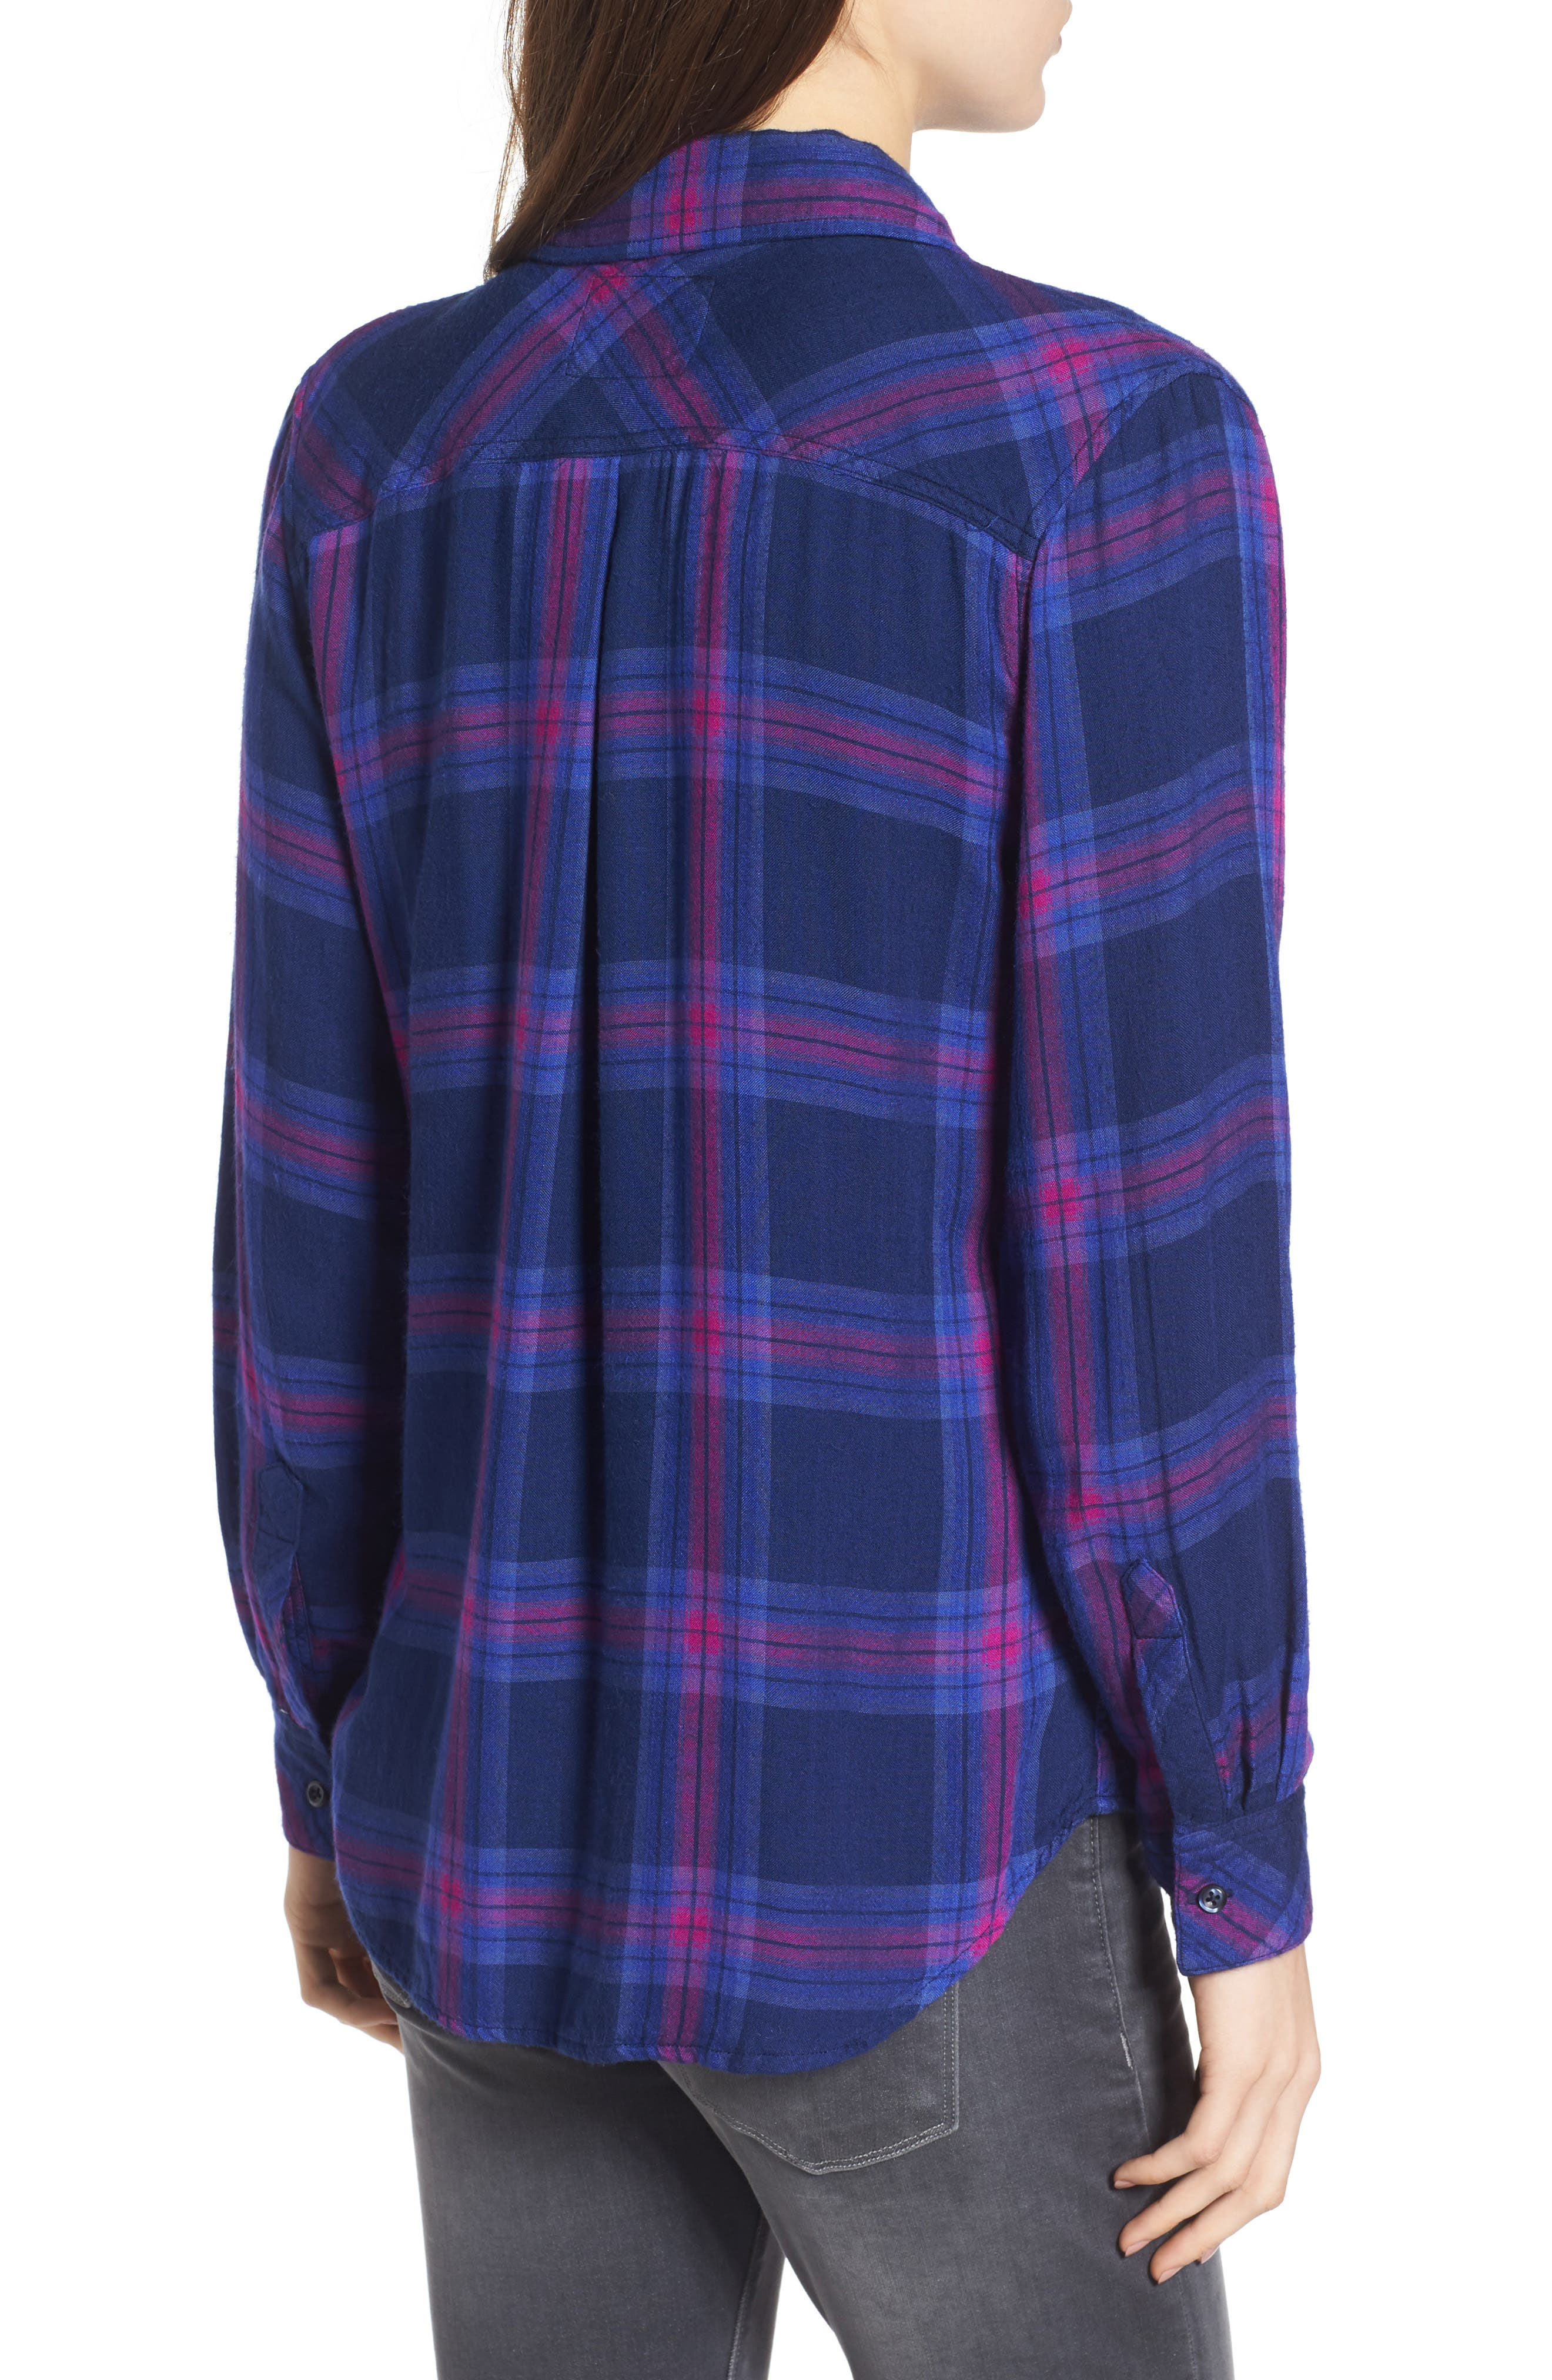 Taitum Plaid Shirt,                             Alternate thumbnail 2, color,